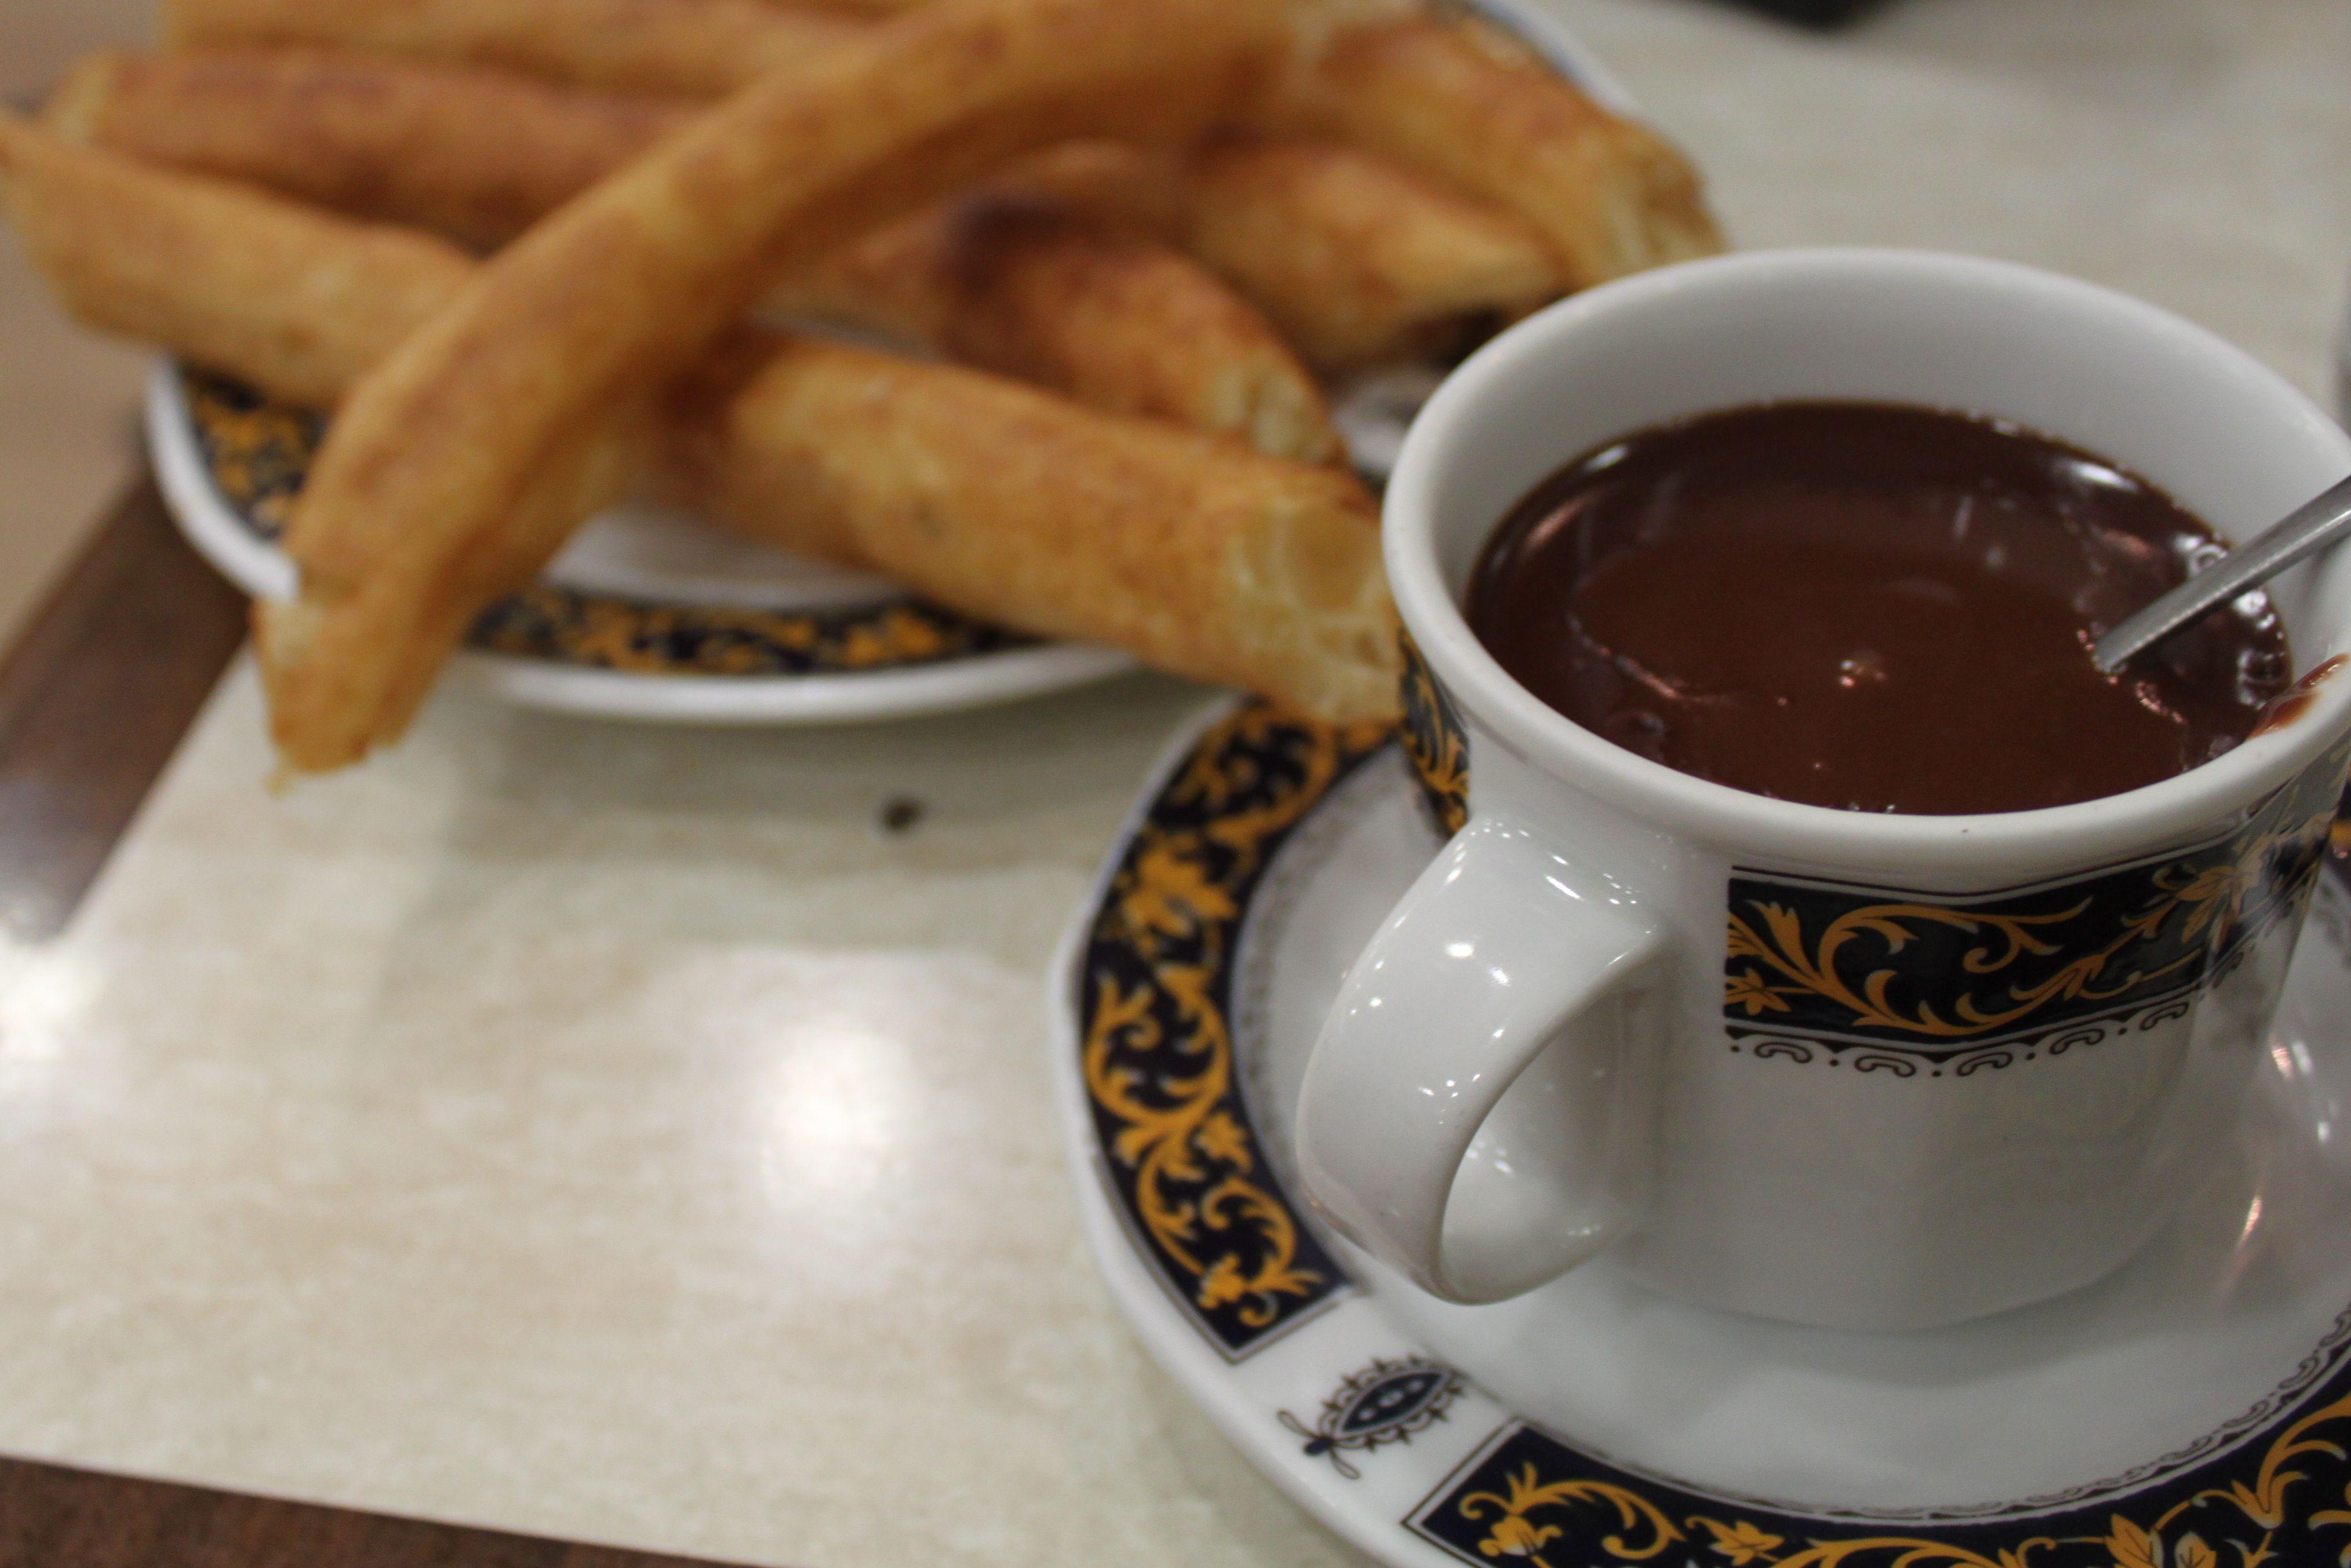 chocolate con churros, granada